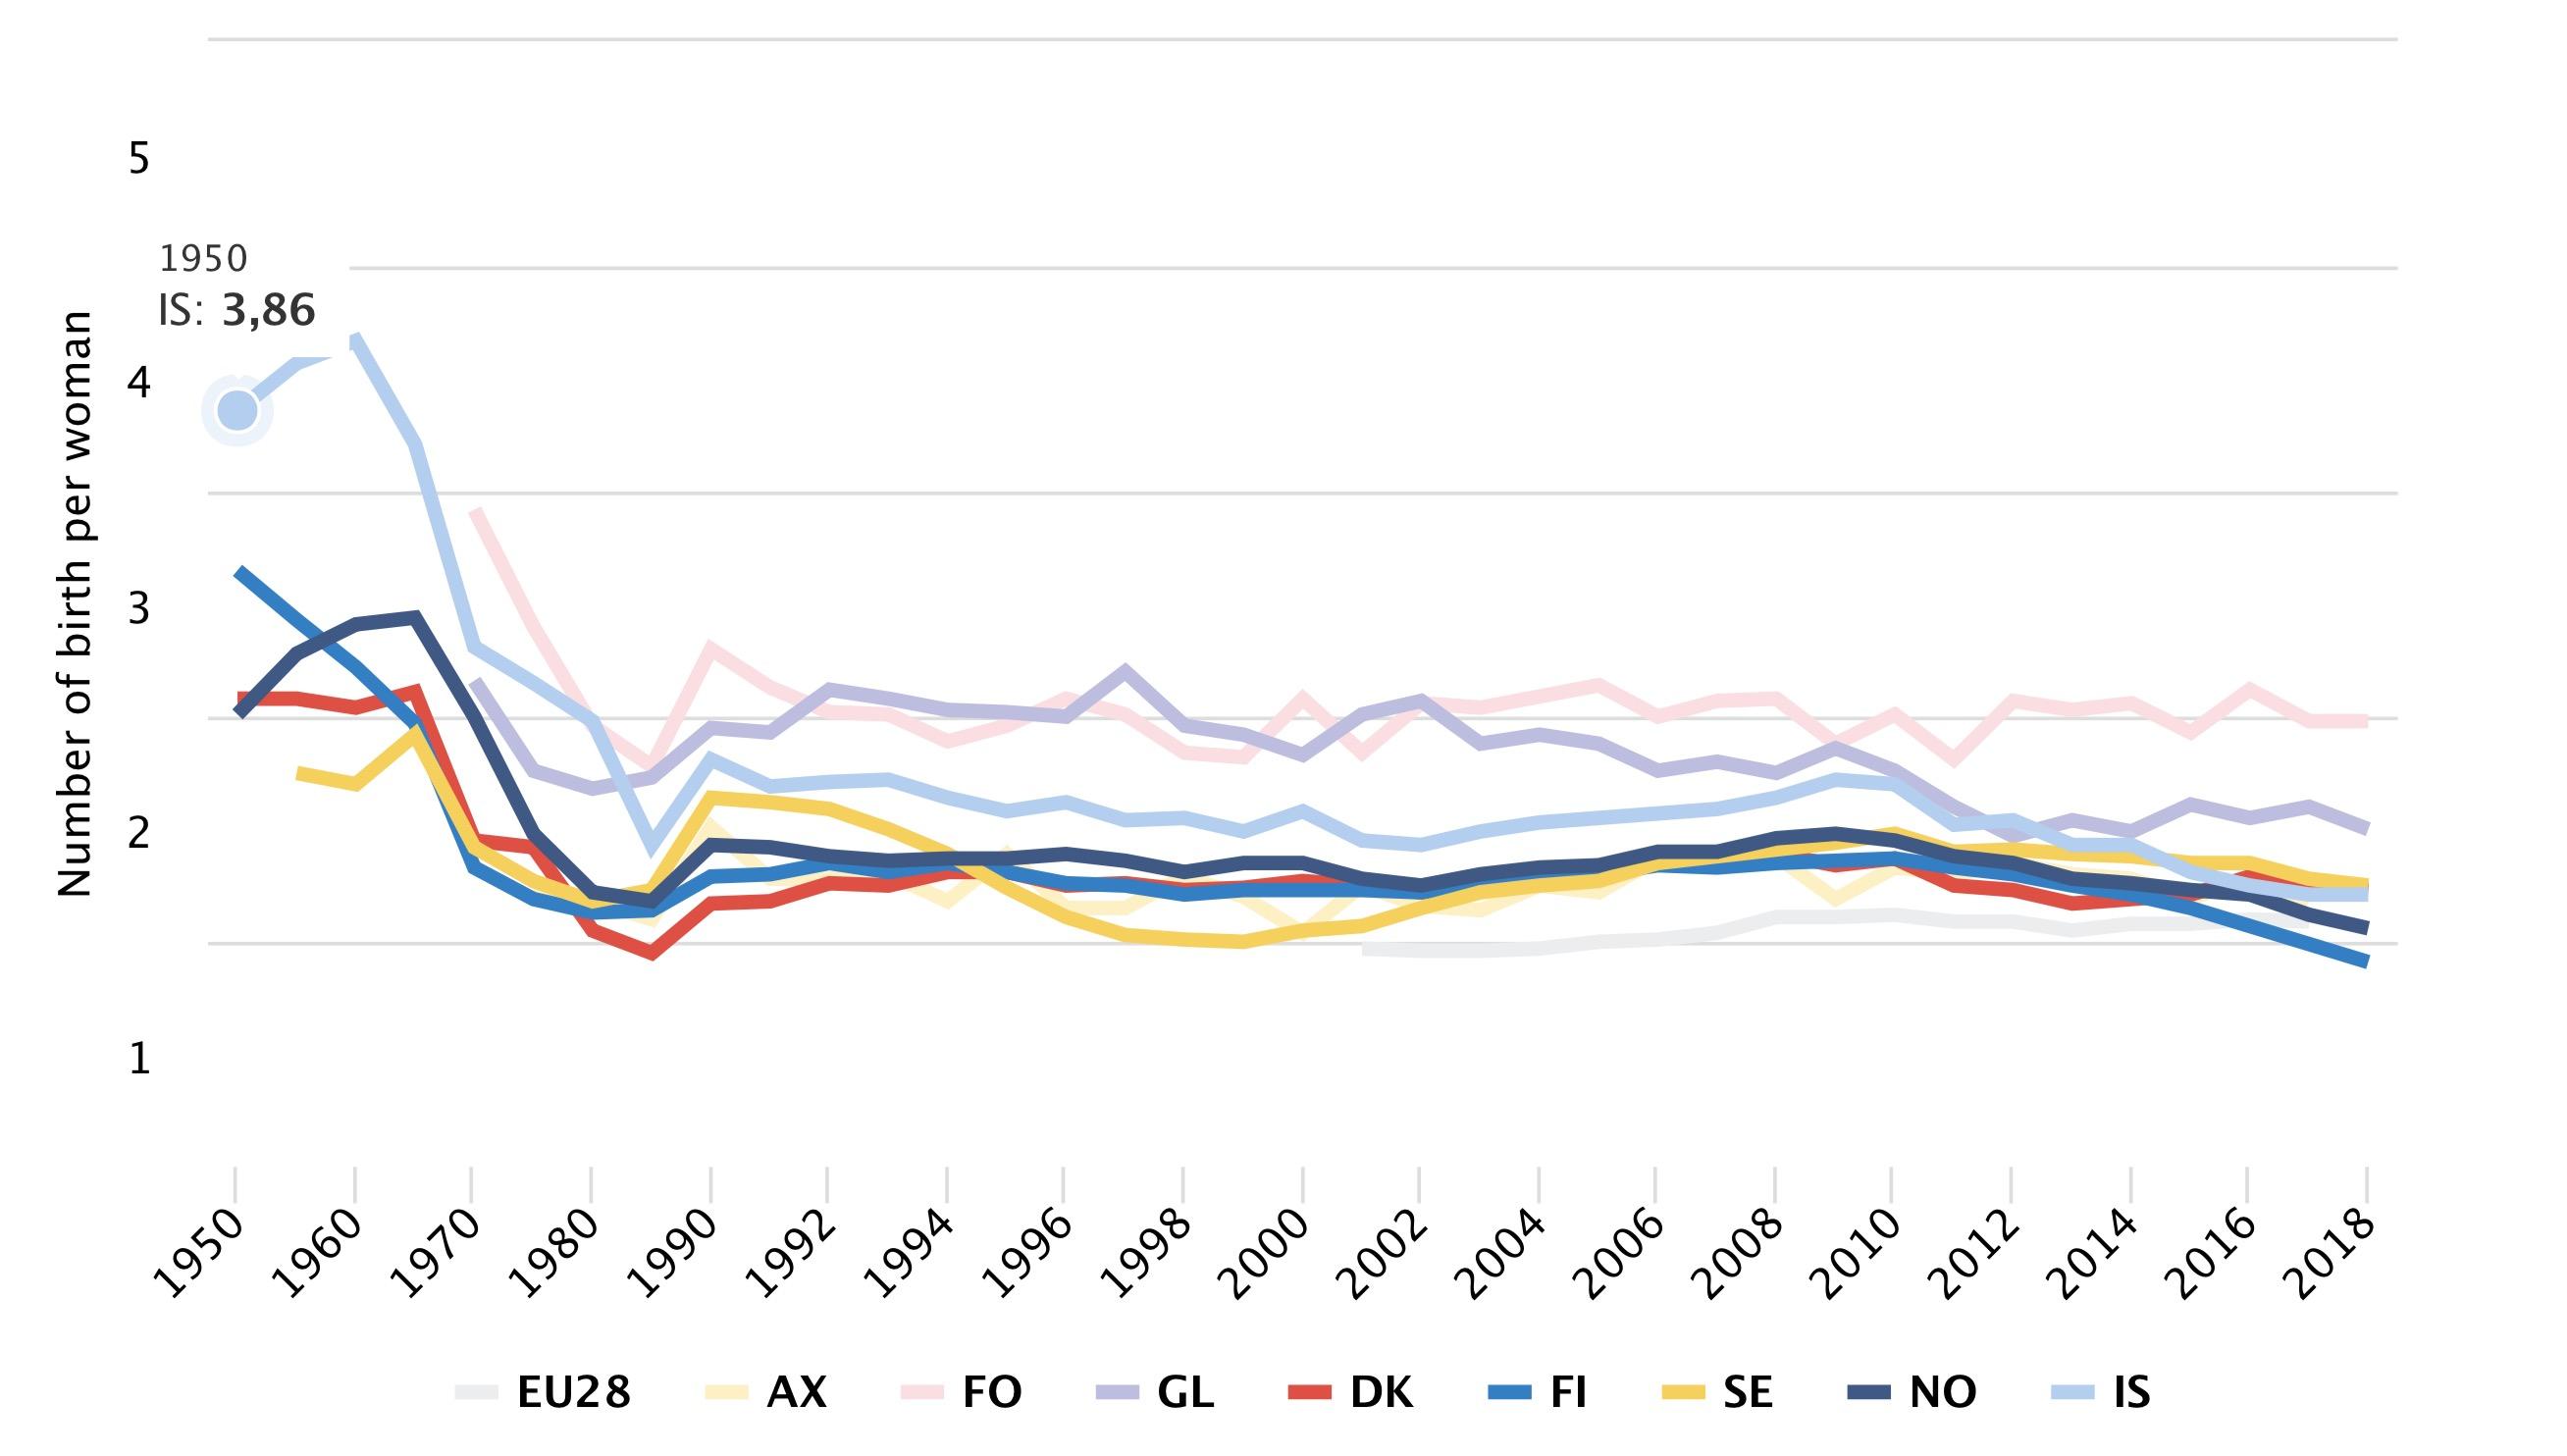 Nordic fertility rates